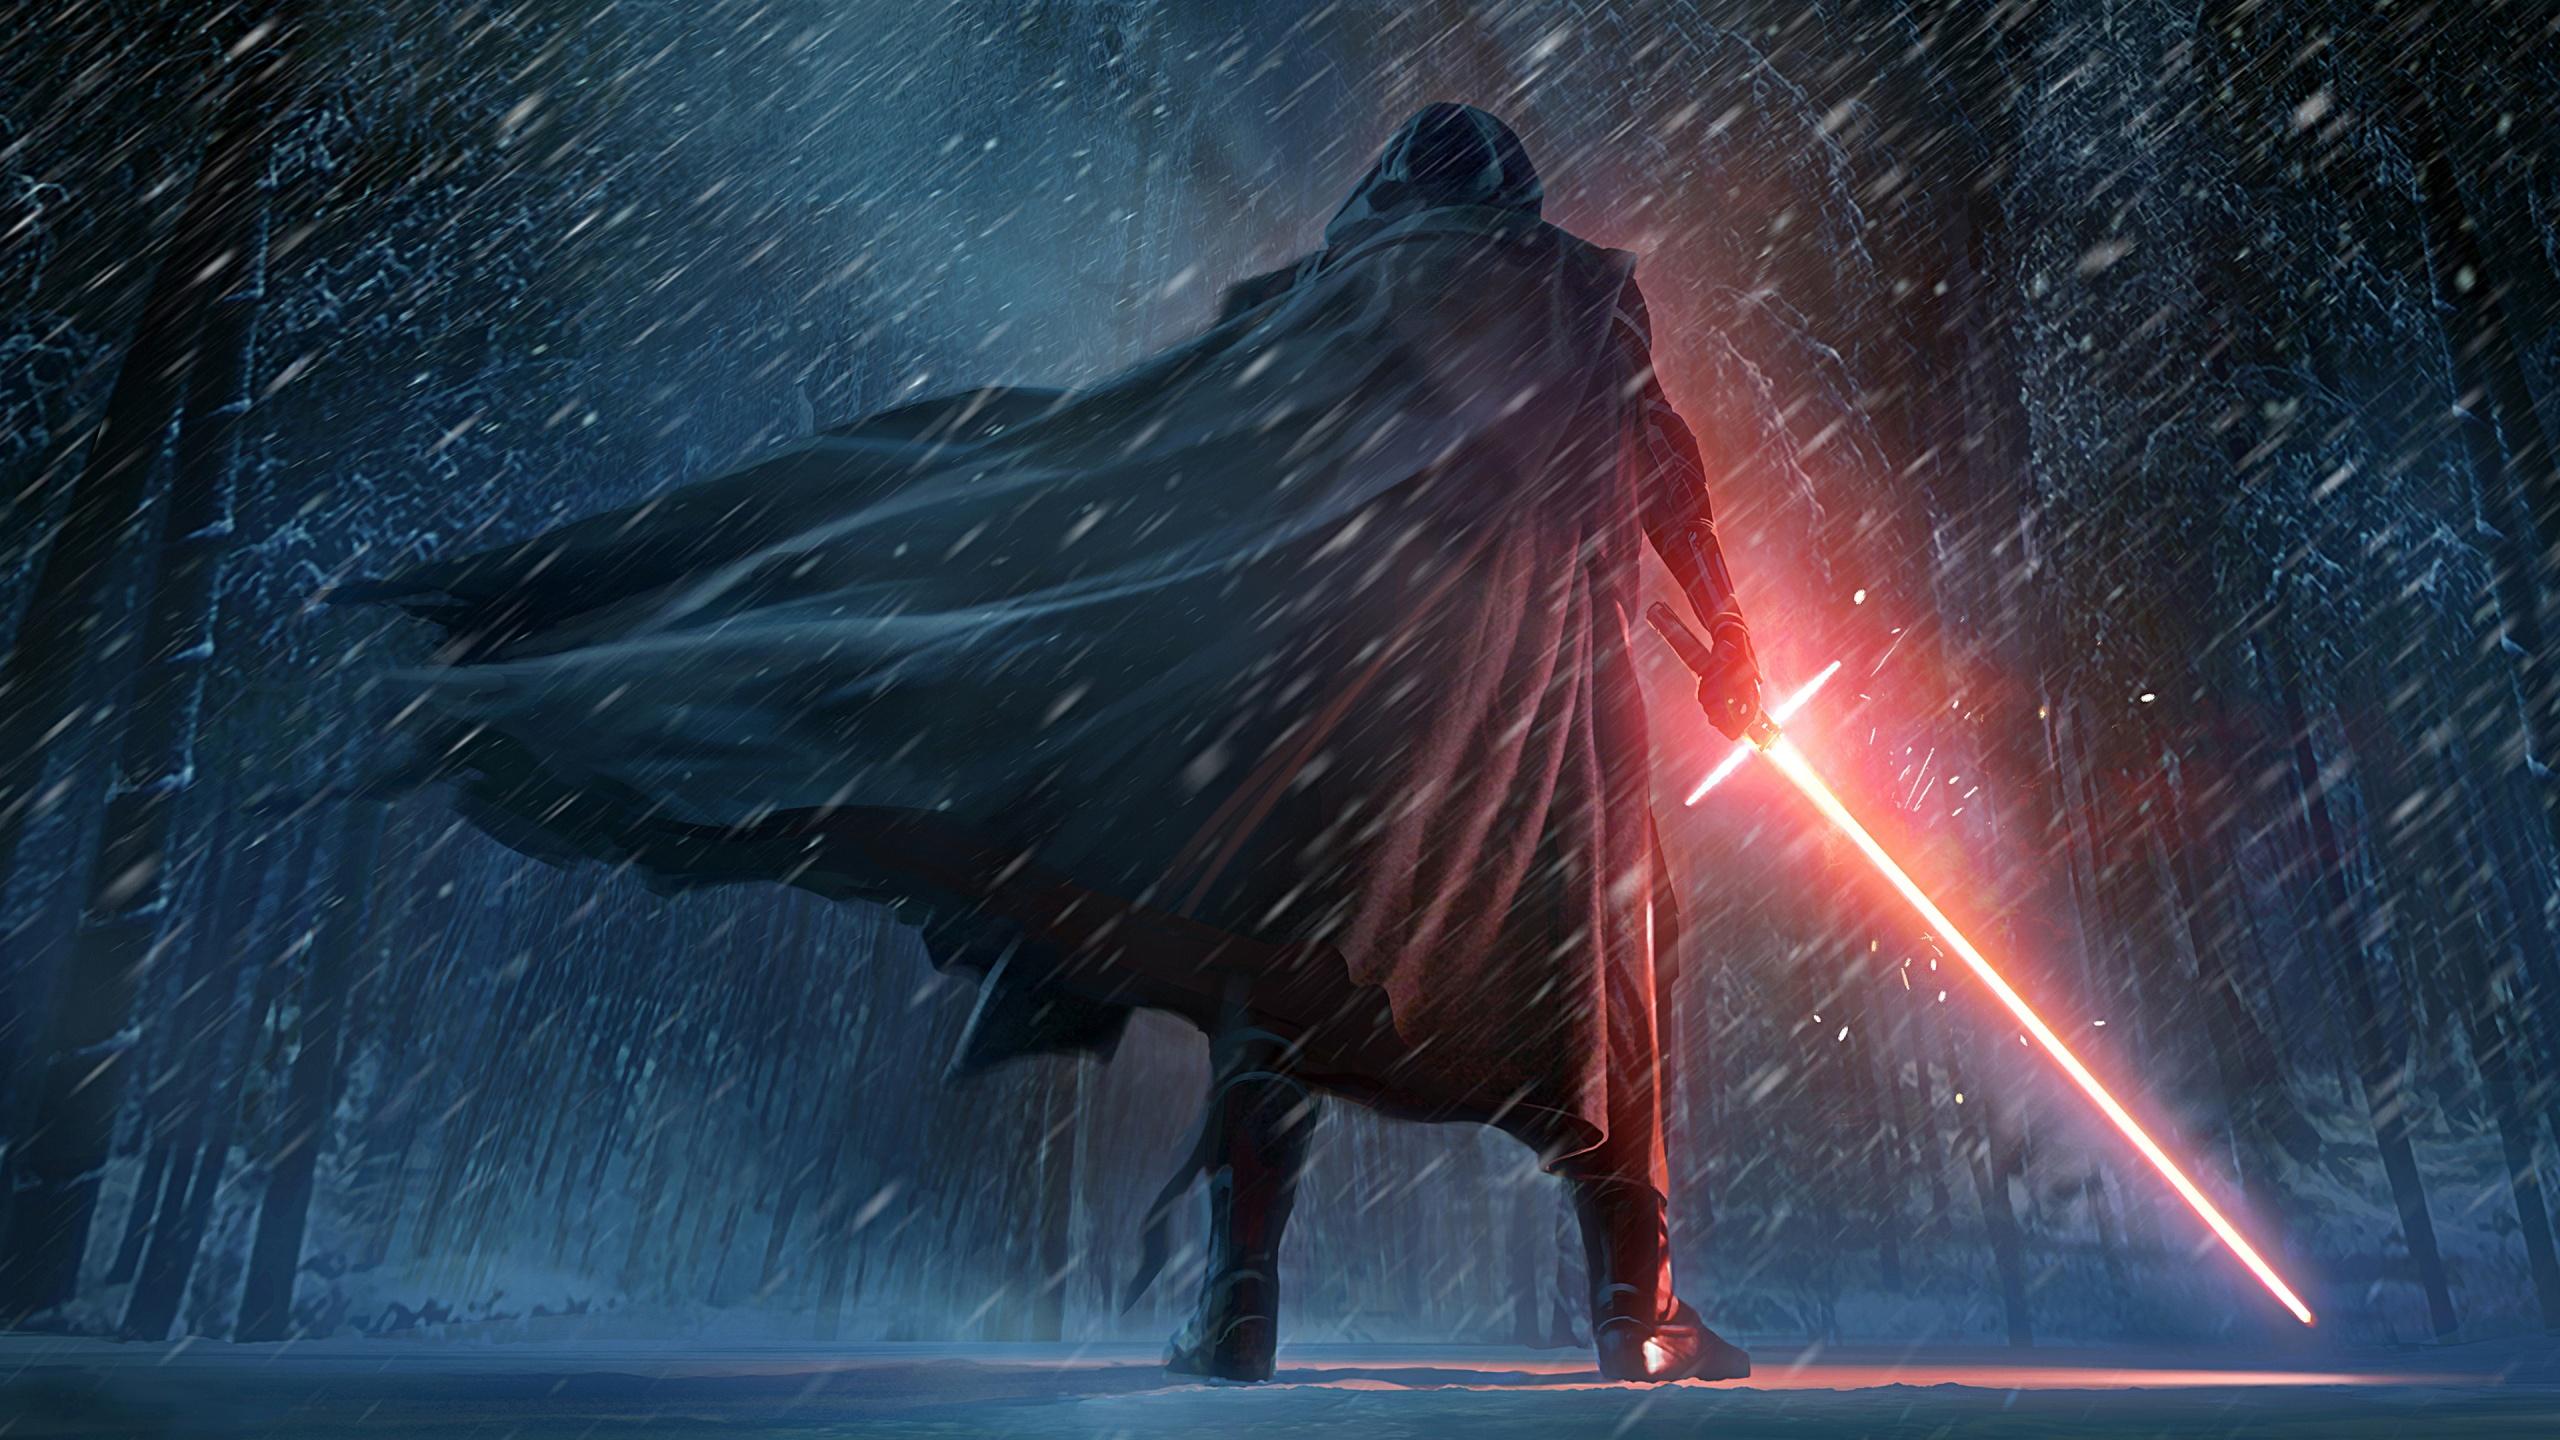 Kylo Ren Star Wars The Force Awakens Artwork Wallpapers HD 2560x1440